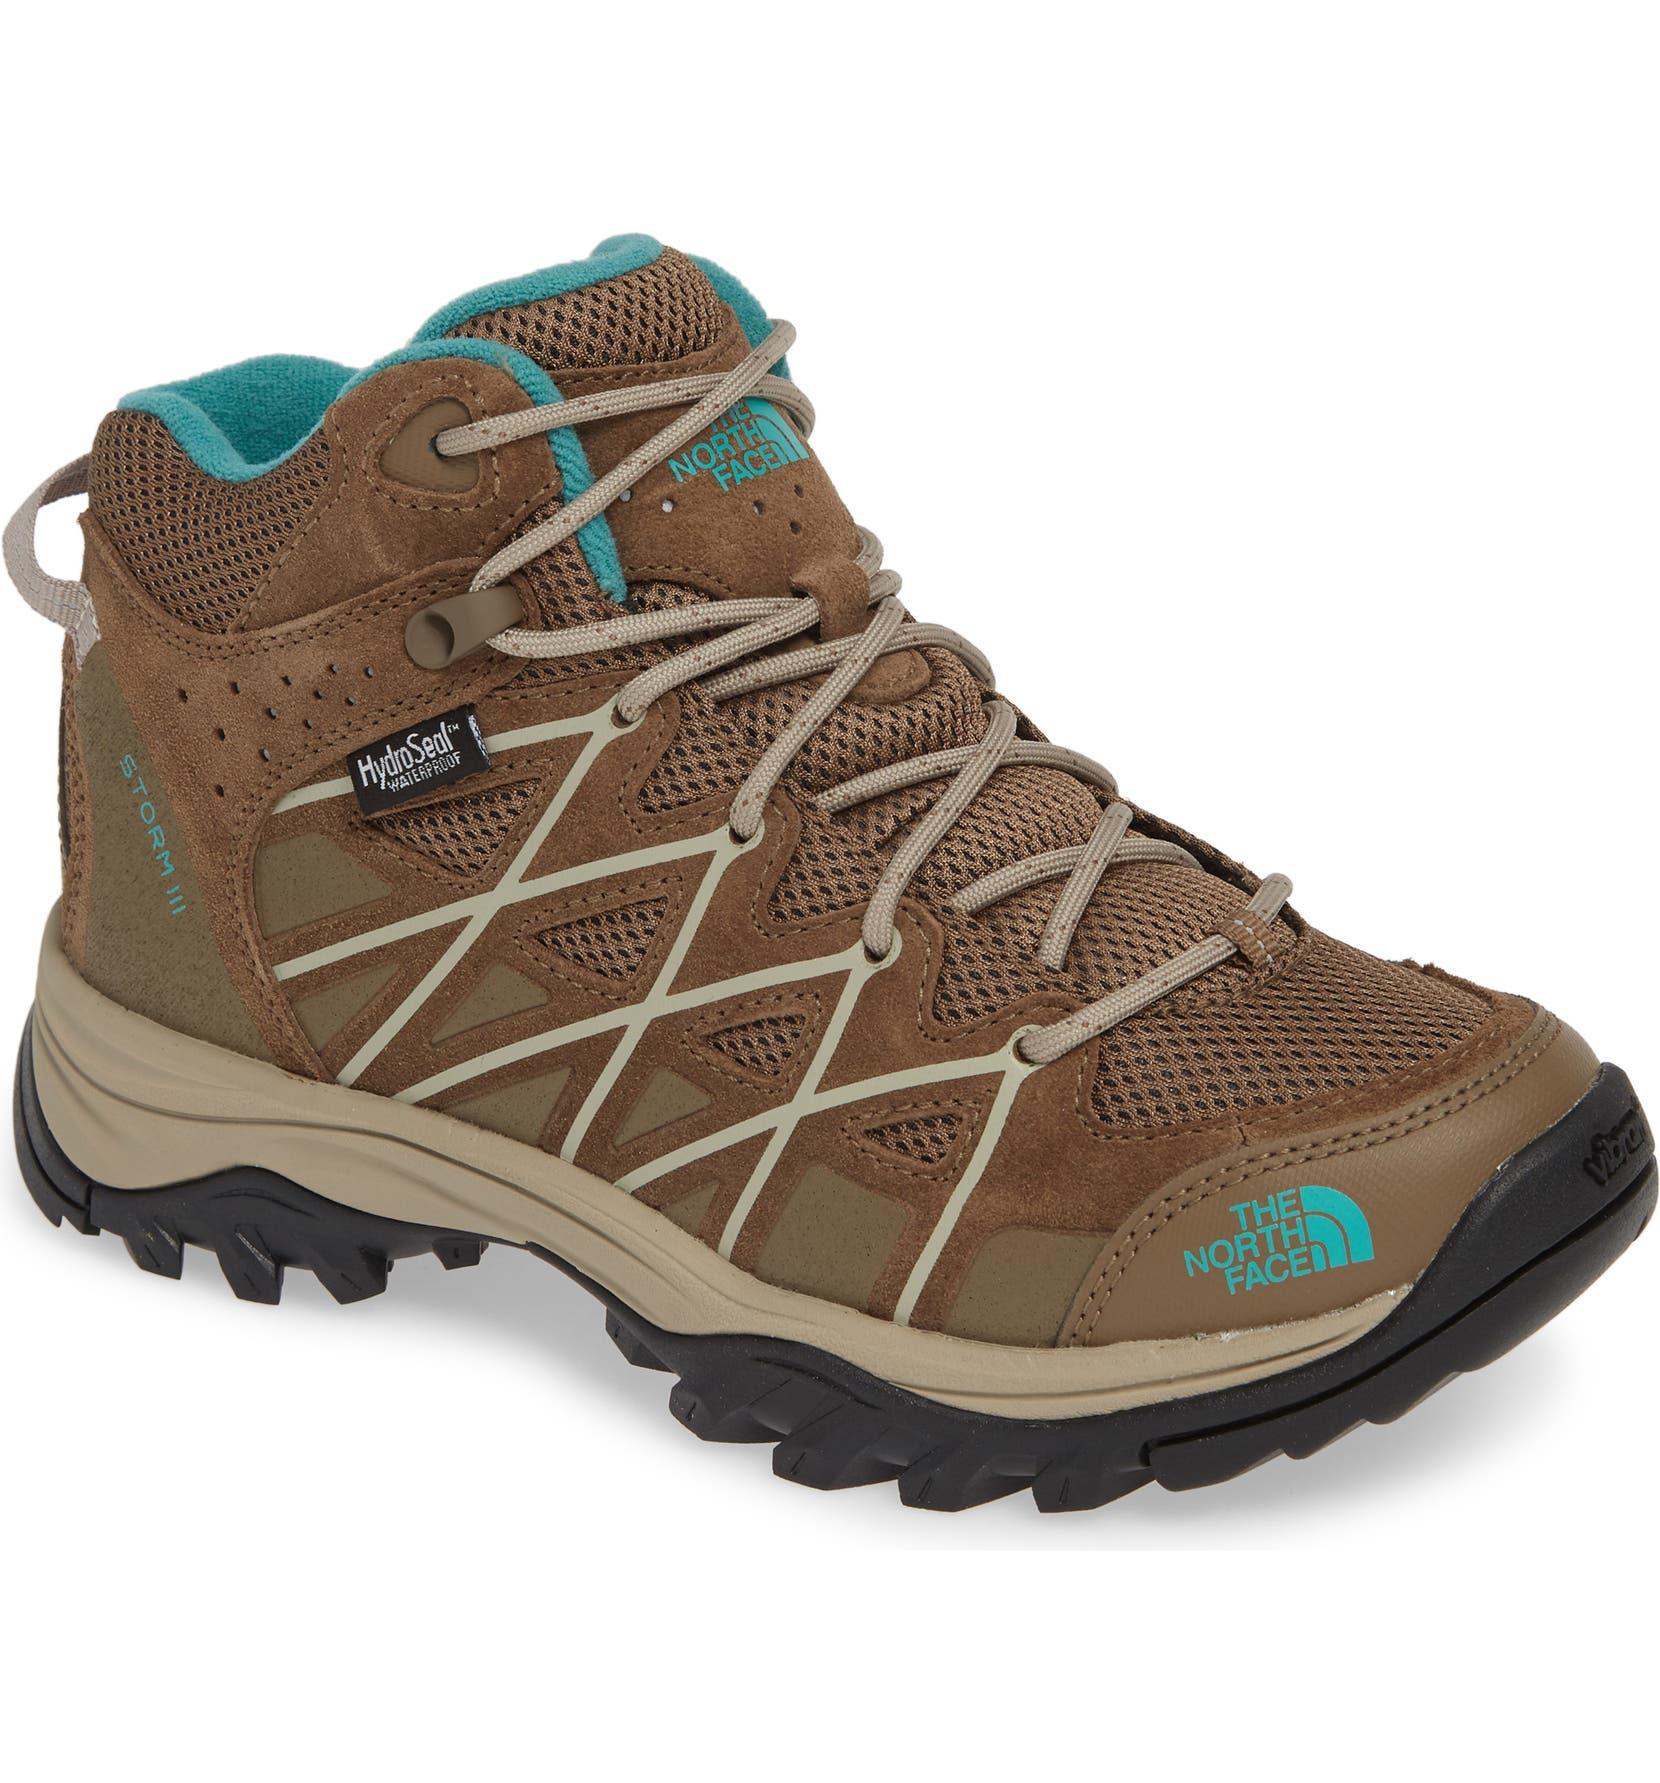 d09804f3262 Storm III Mid Waterproof Hiking Boot